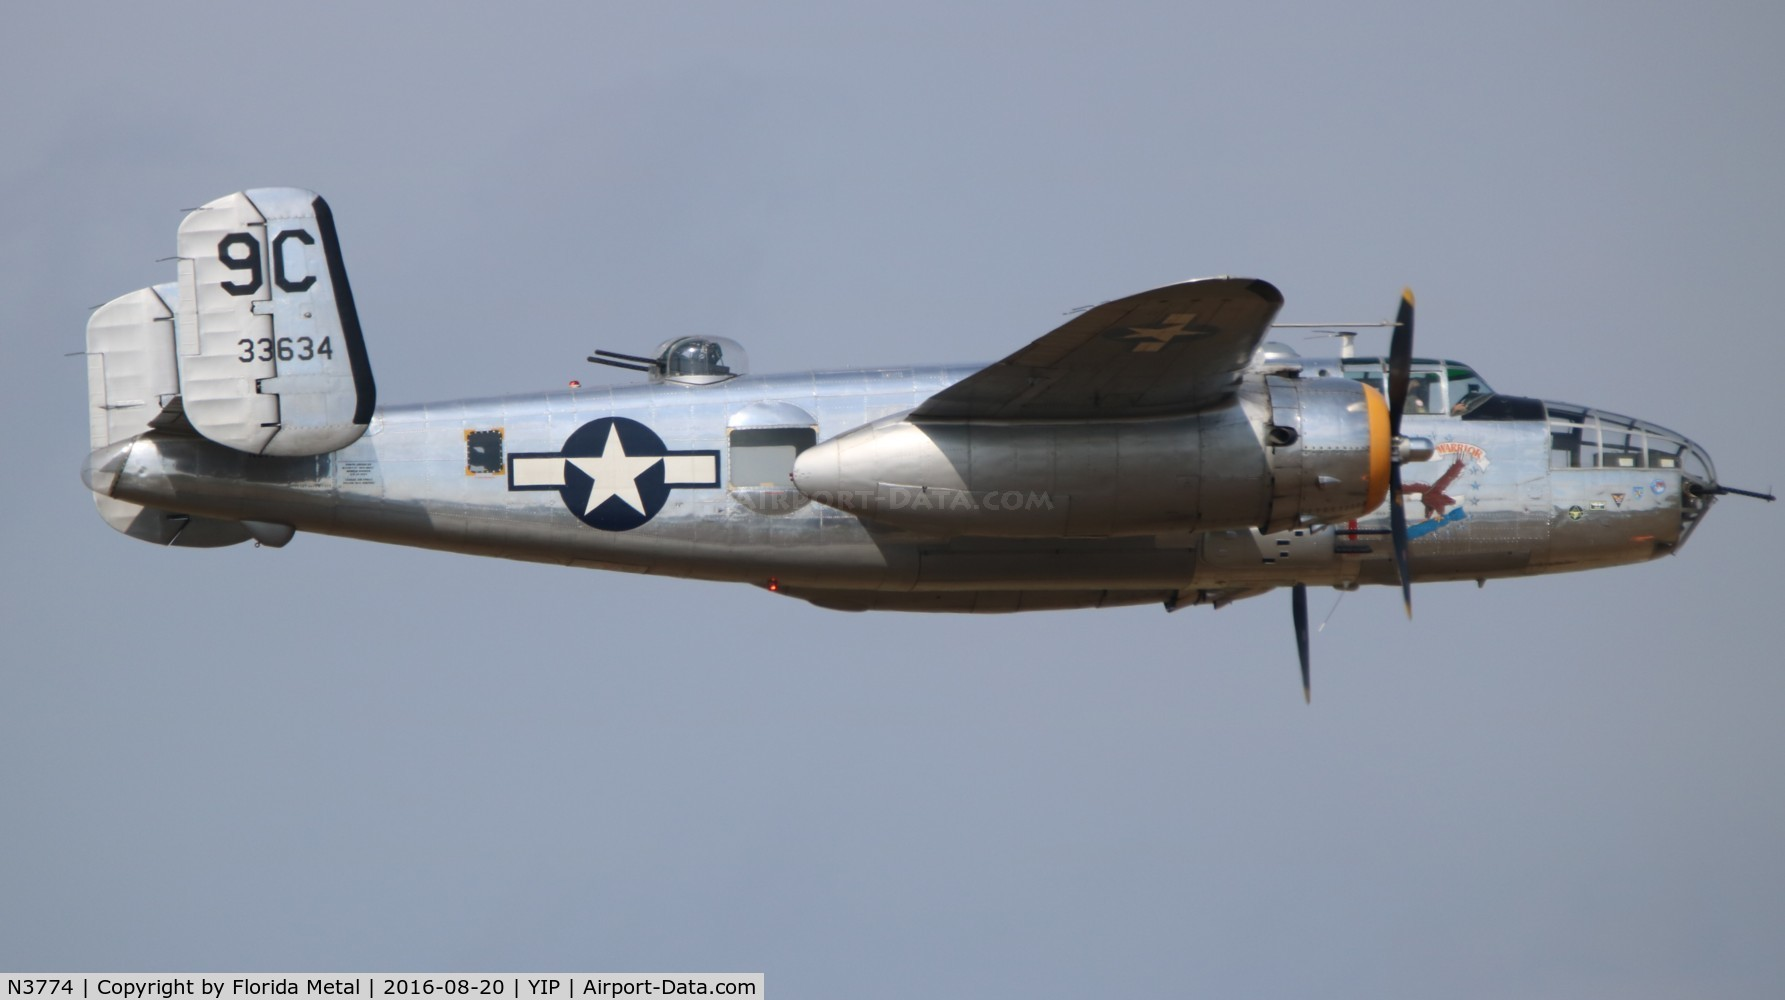 N3774, 1943 North American B-25D Mitchell C/N 100-23960, Yankee Warrior